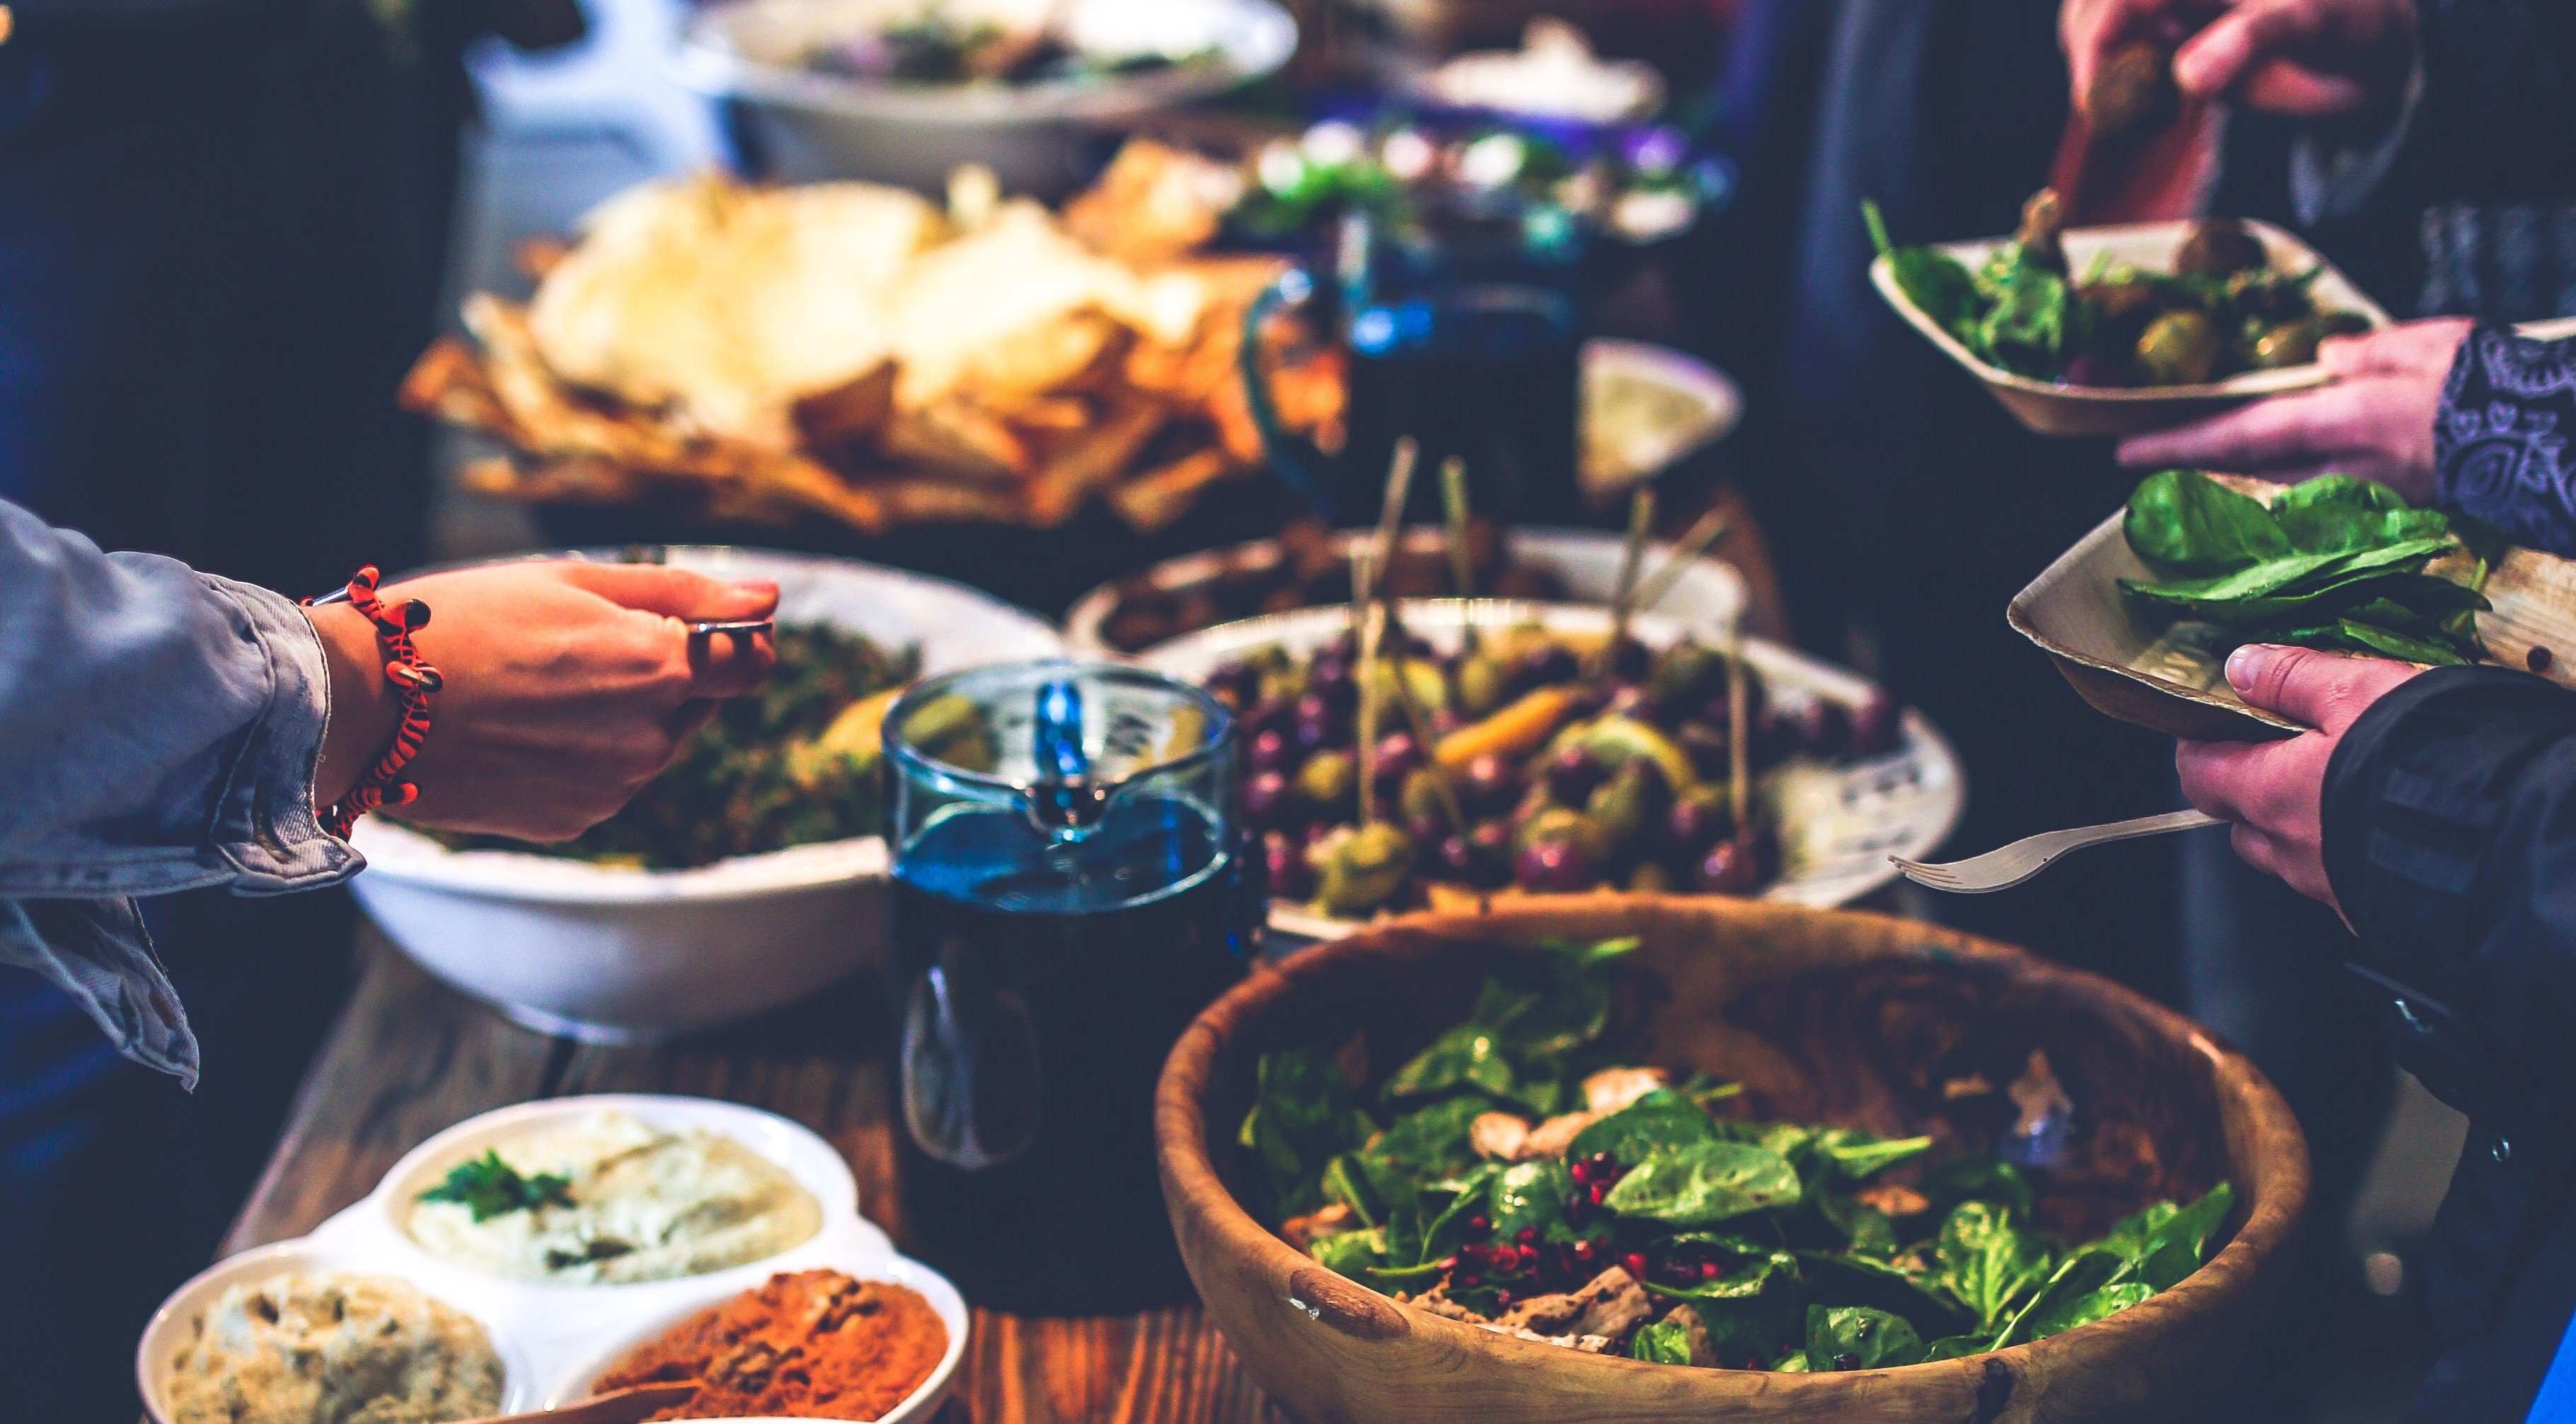 The Freshest Irish Food Festival Trends for 2019